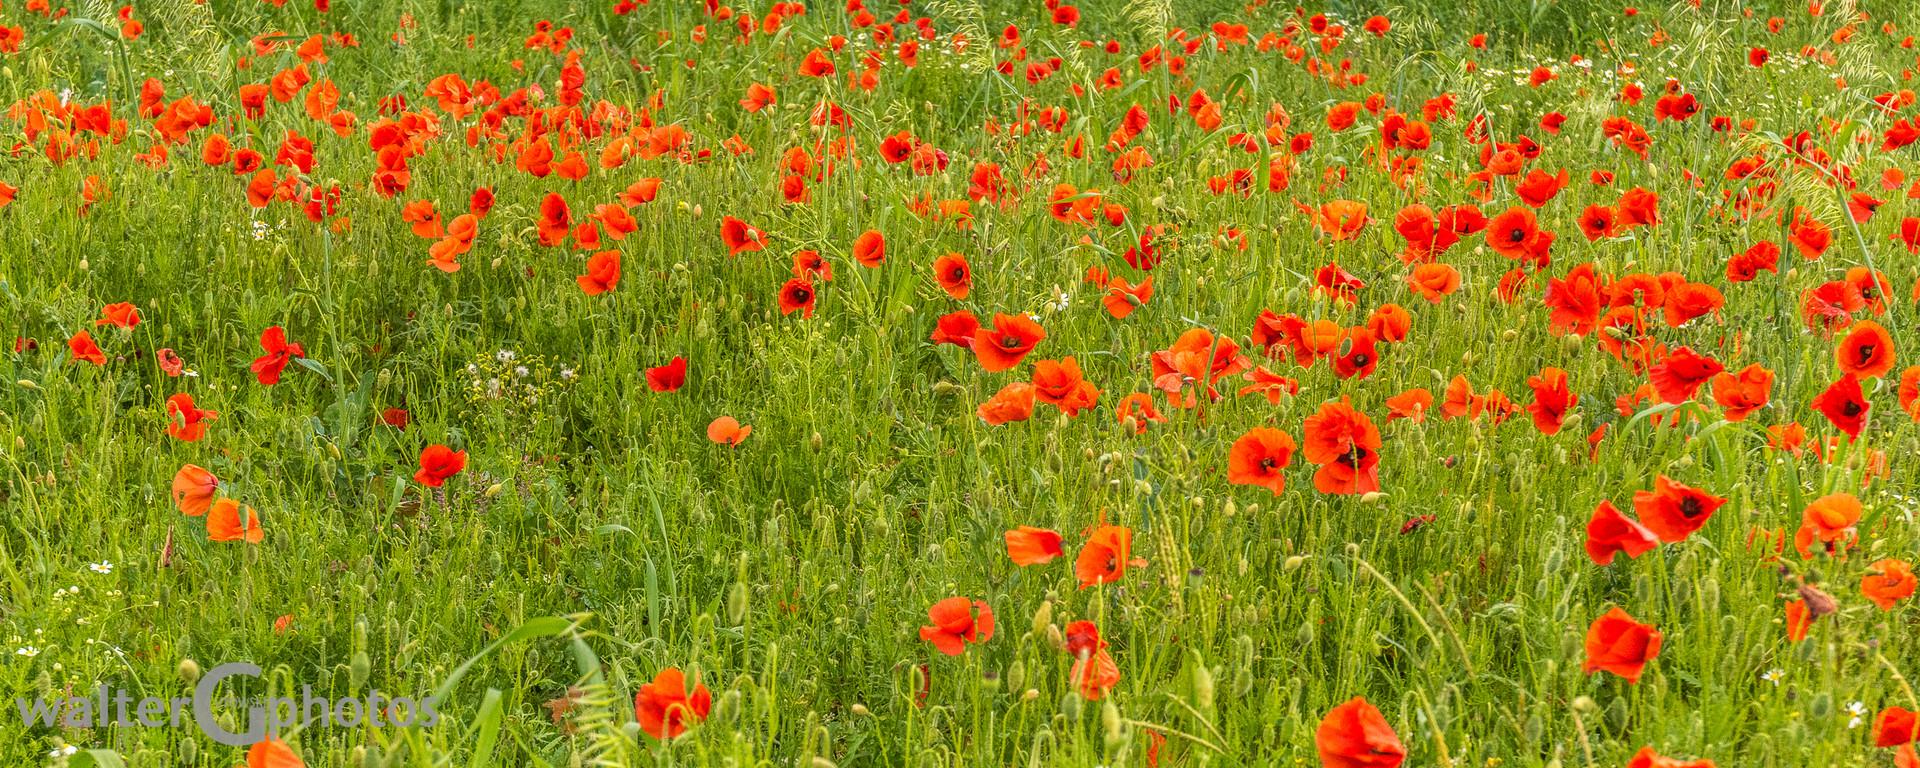 Poppy field, Stonehenge, England